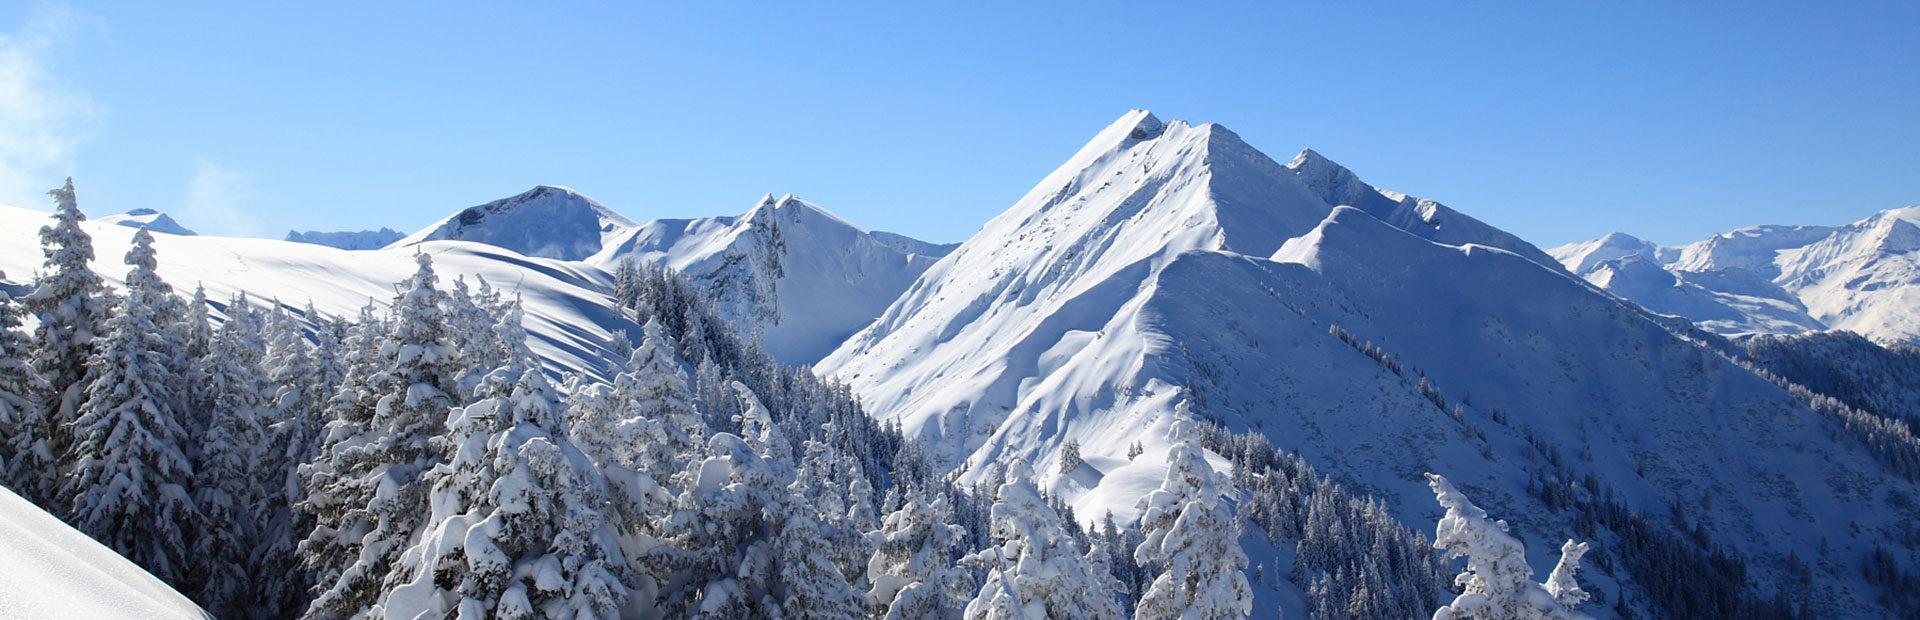 Winterurlaub im Pfandlinghof Grossarl, Skiurlaub Grossarltal